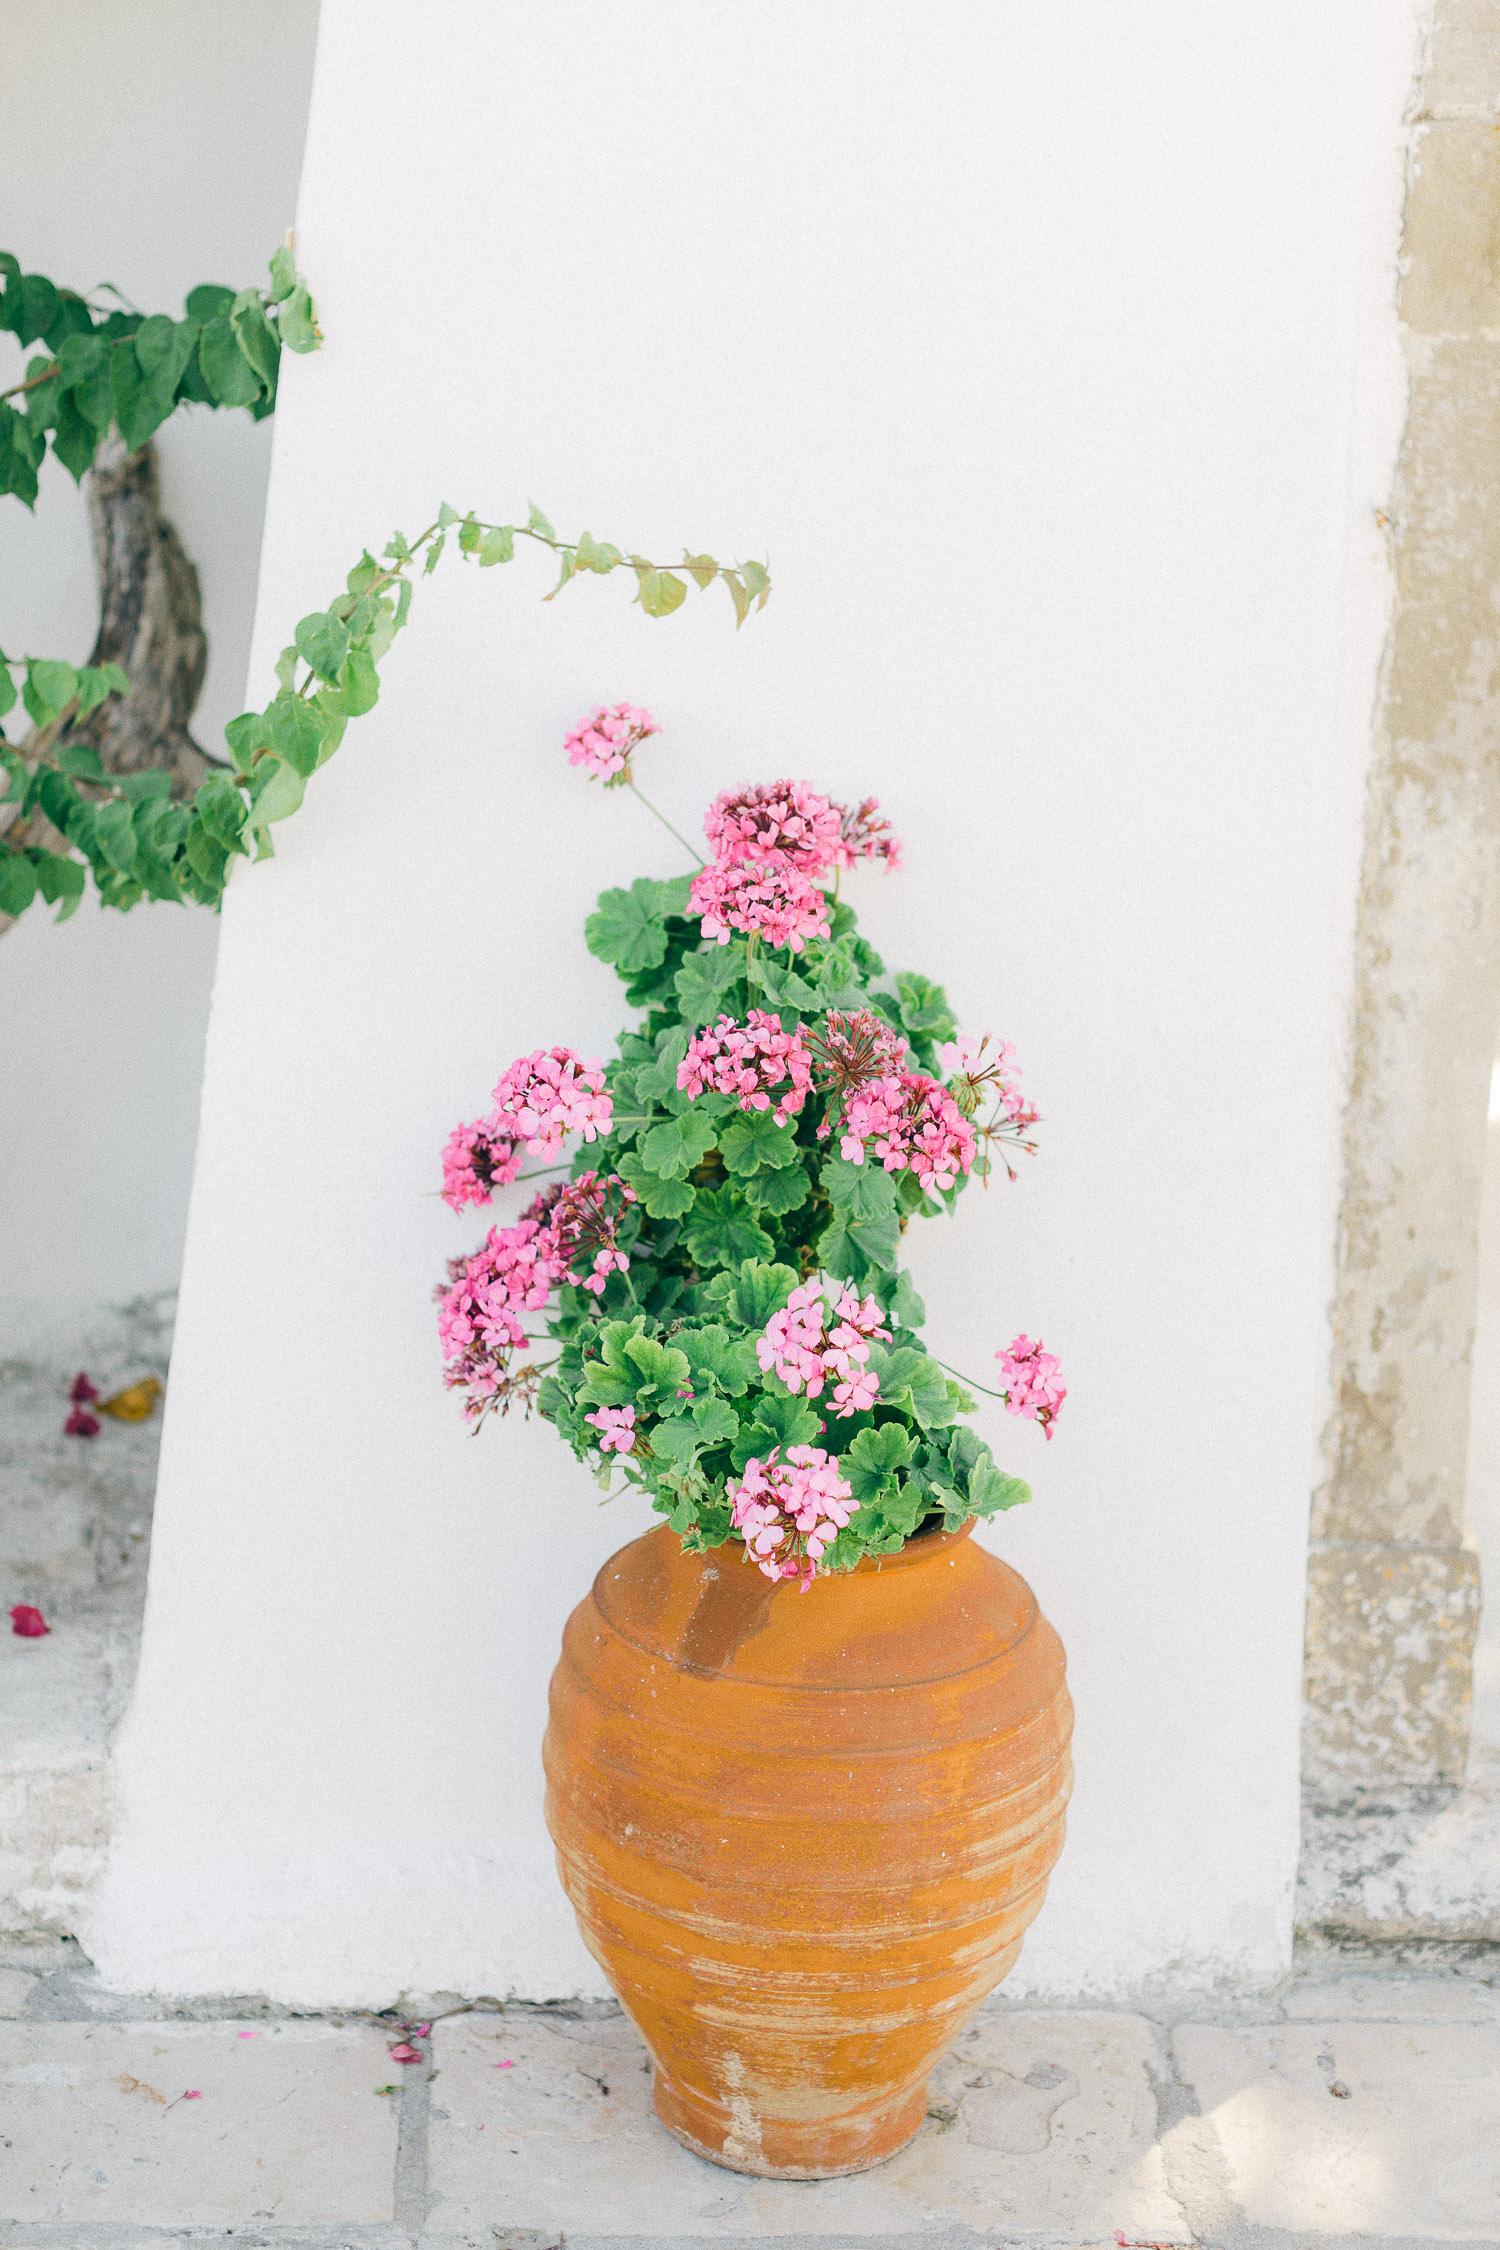 Pink blooms decor at Old World micro wedding in Corfu Island